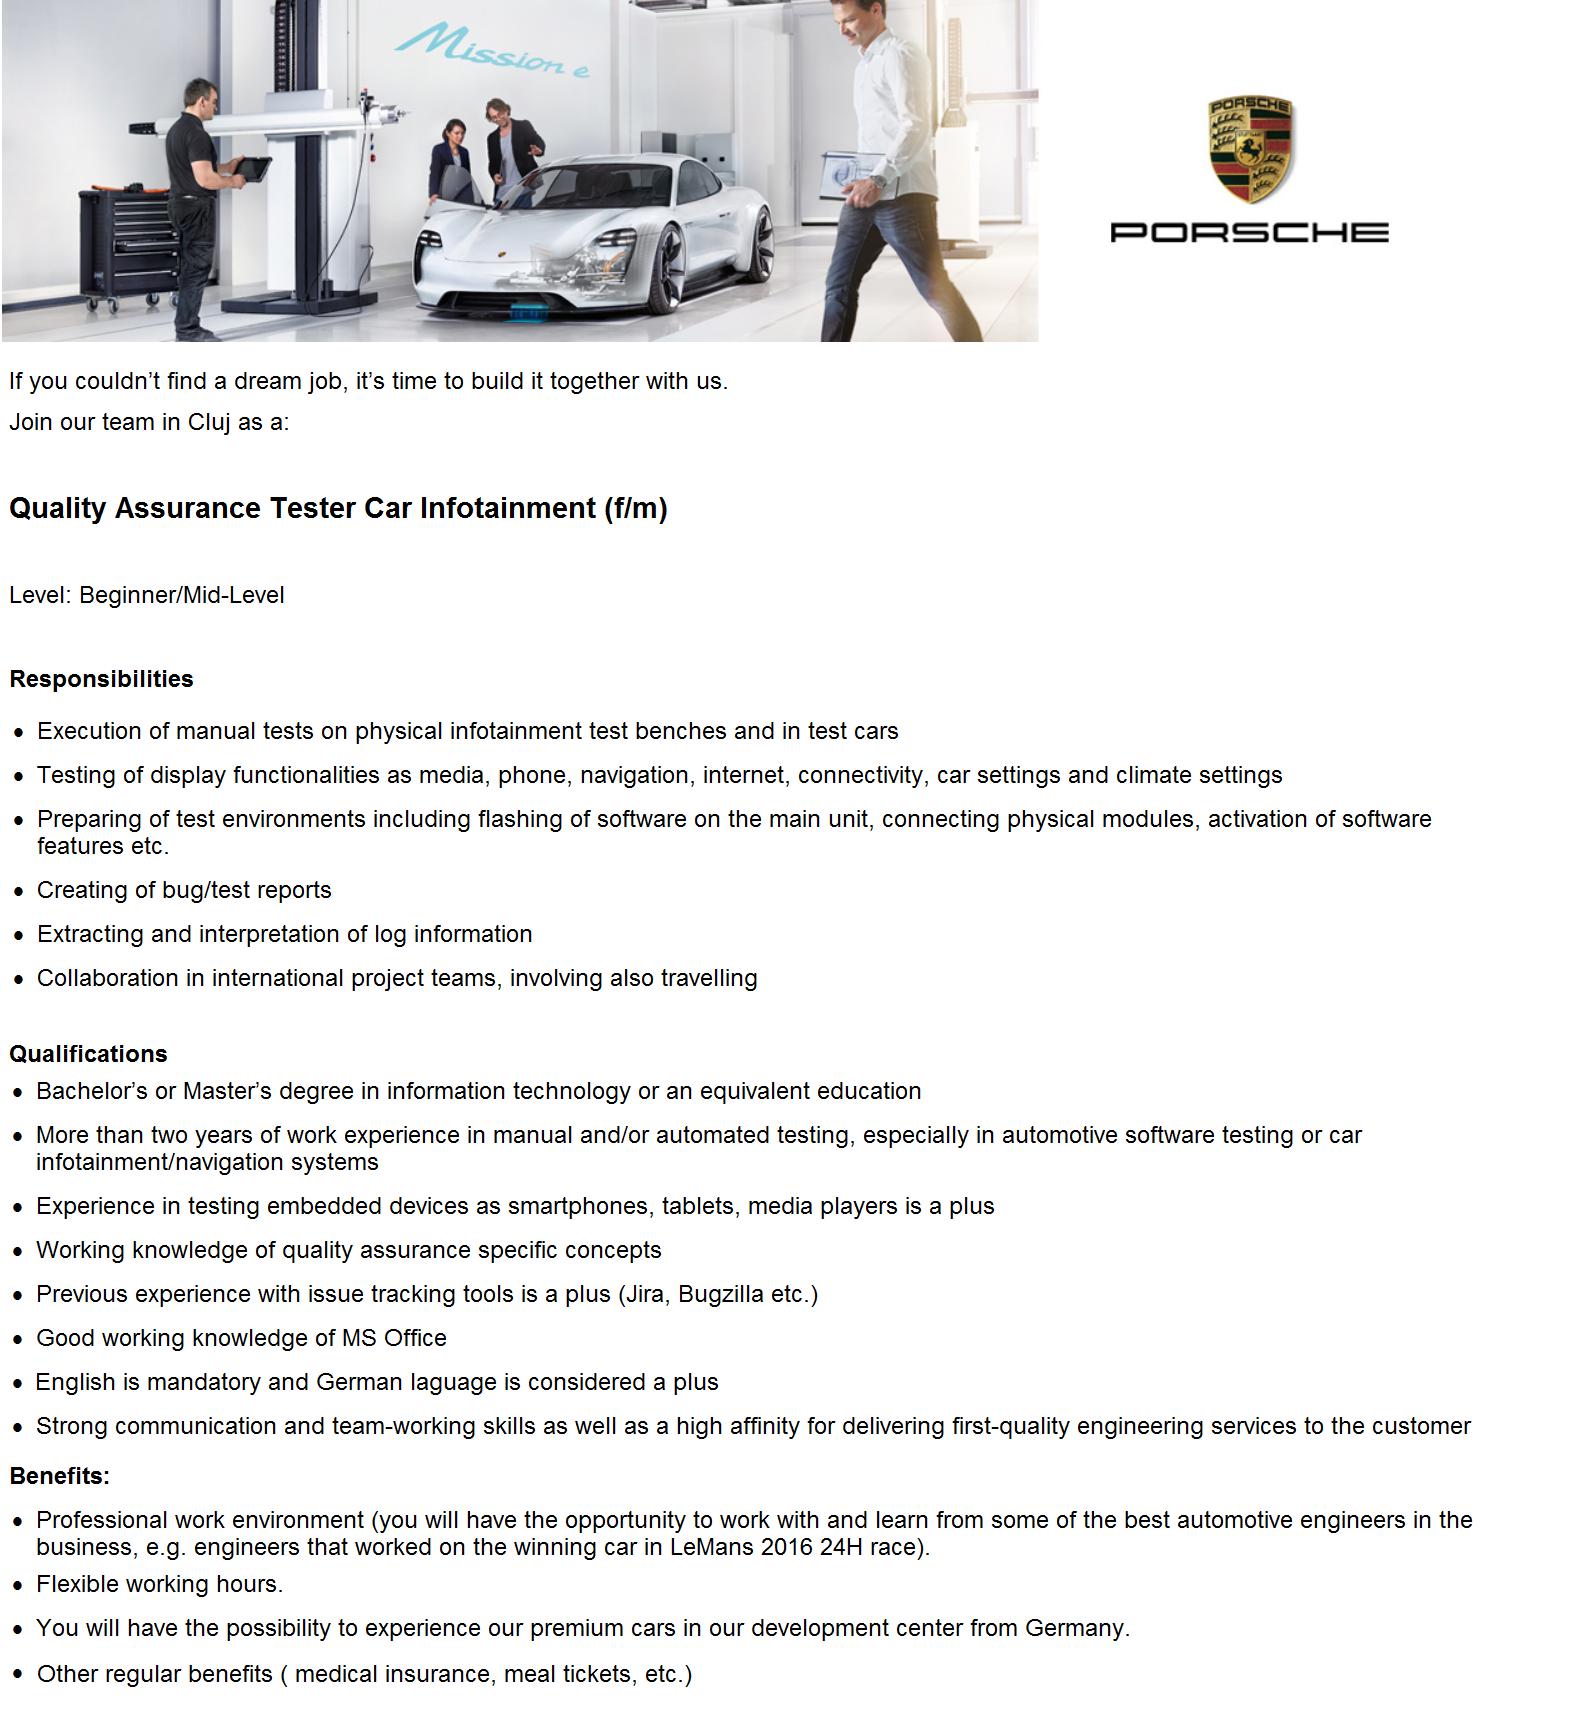 Quality Assurance Tester Car Infotainment (f/m)